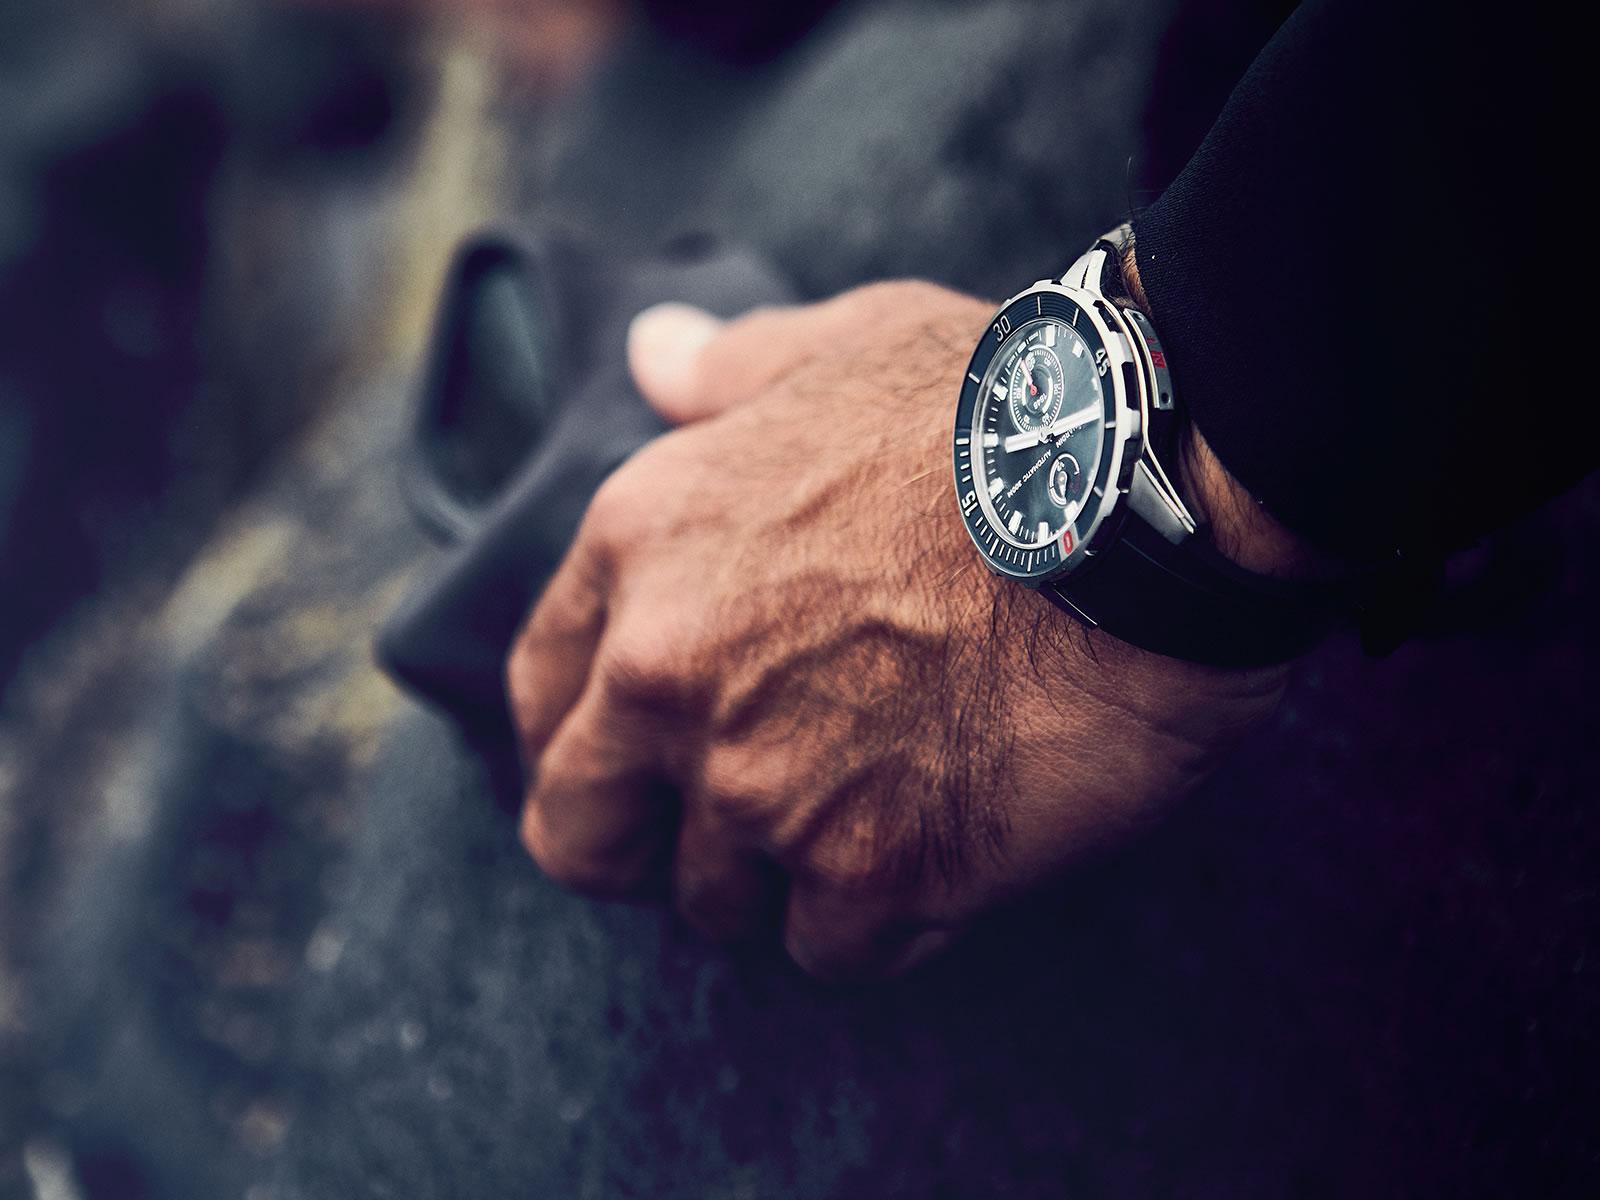 ulysse-nardin-diver-chronometer-2018-models-7-.jpg